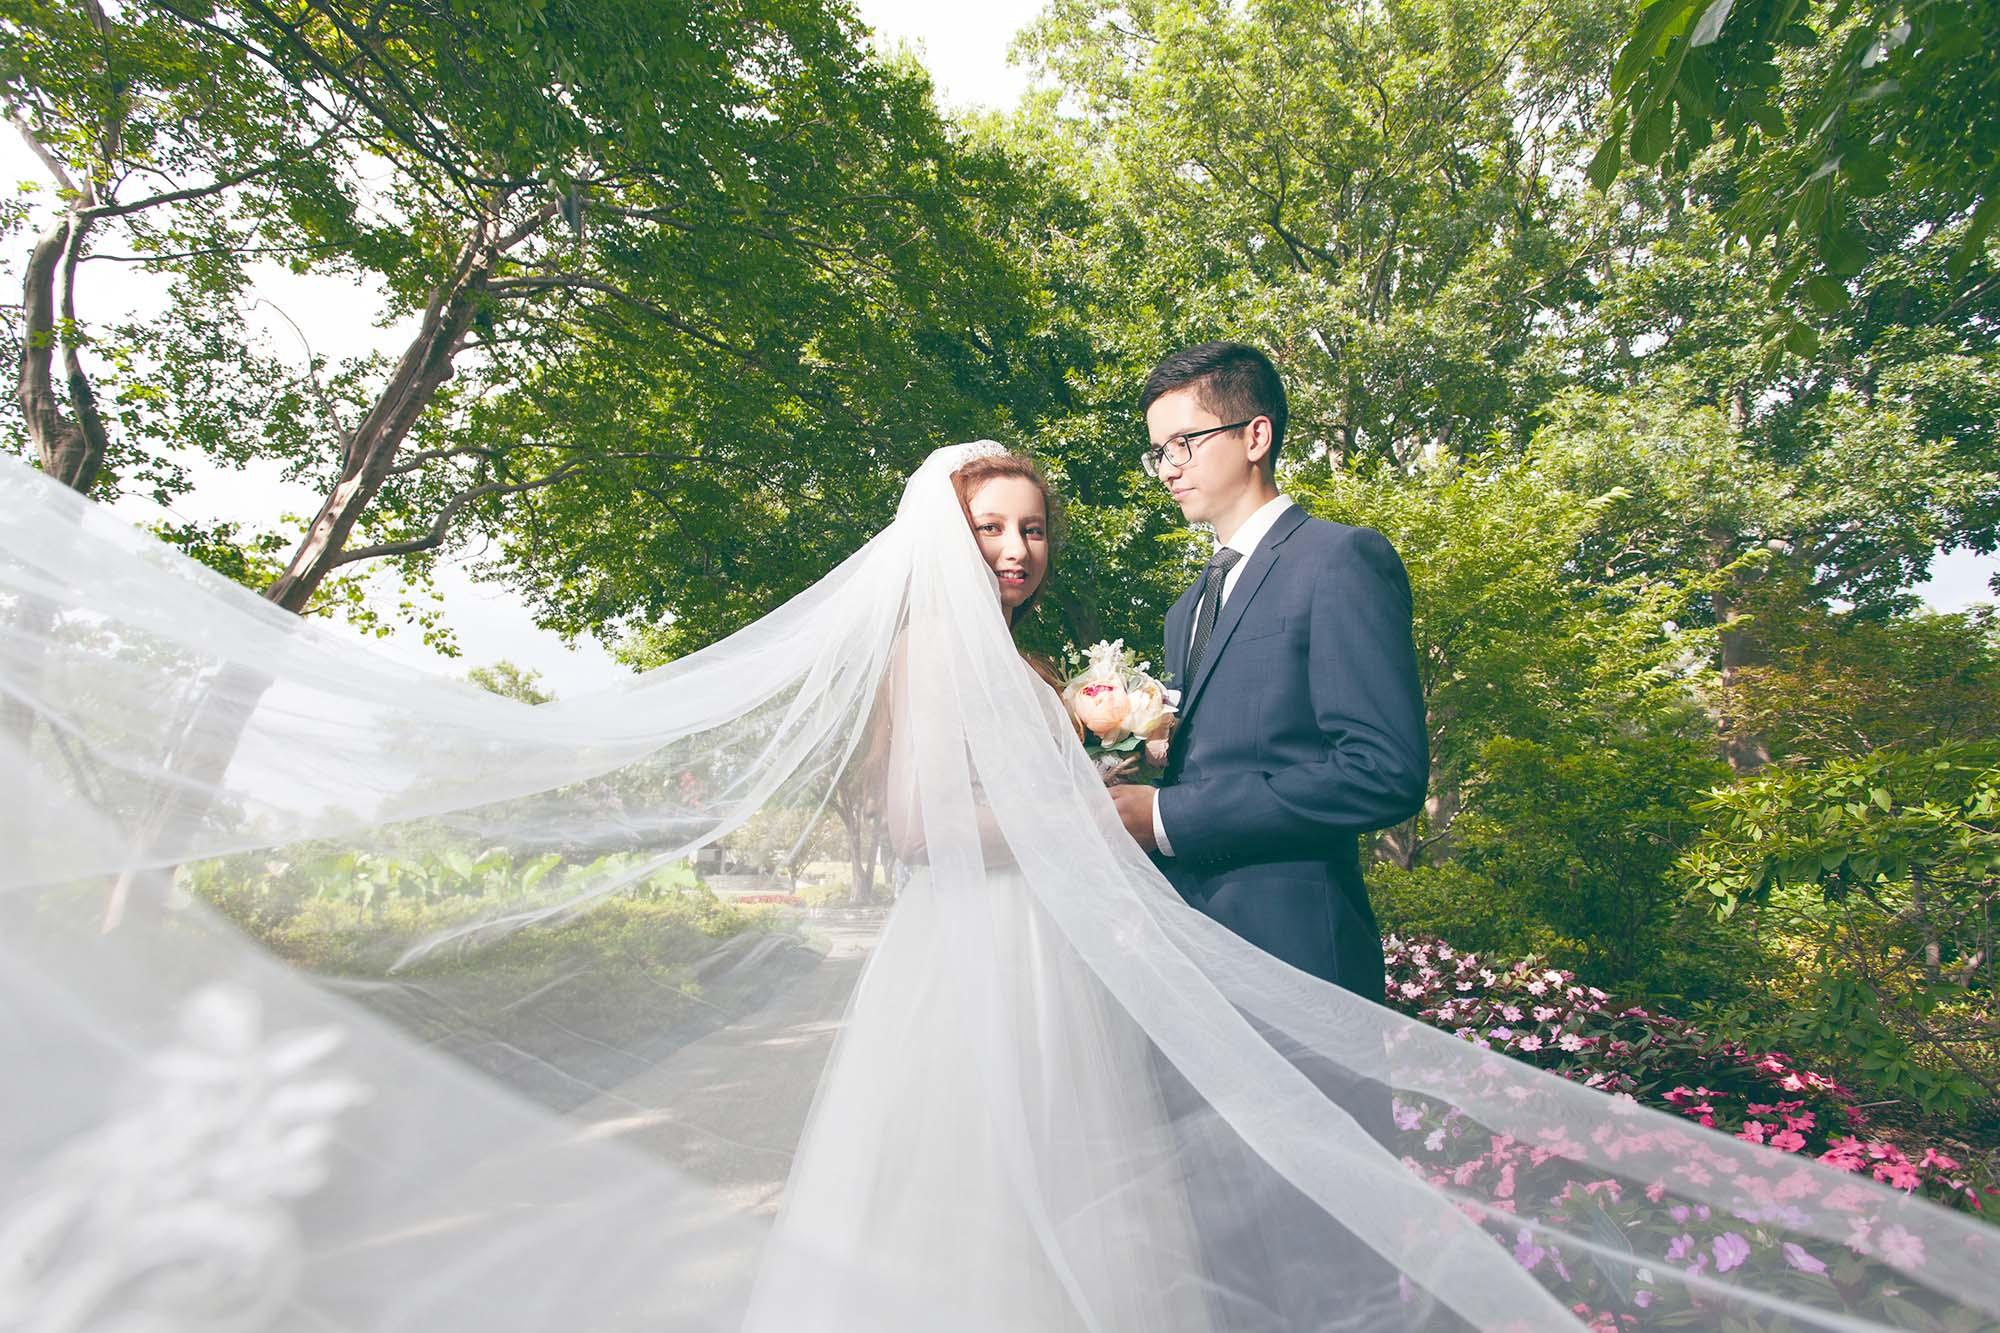 达拉斯婚纱摄影-达拉斯植物园-PlayShoot-Studio